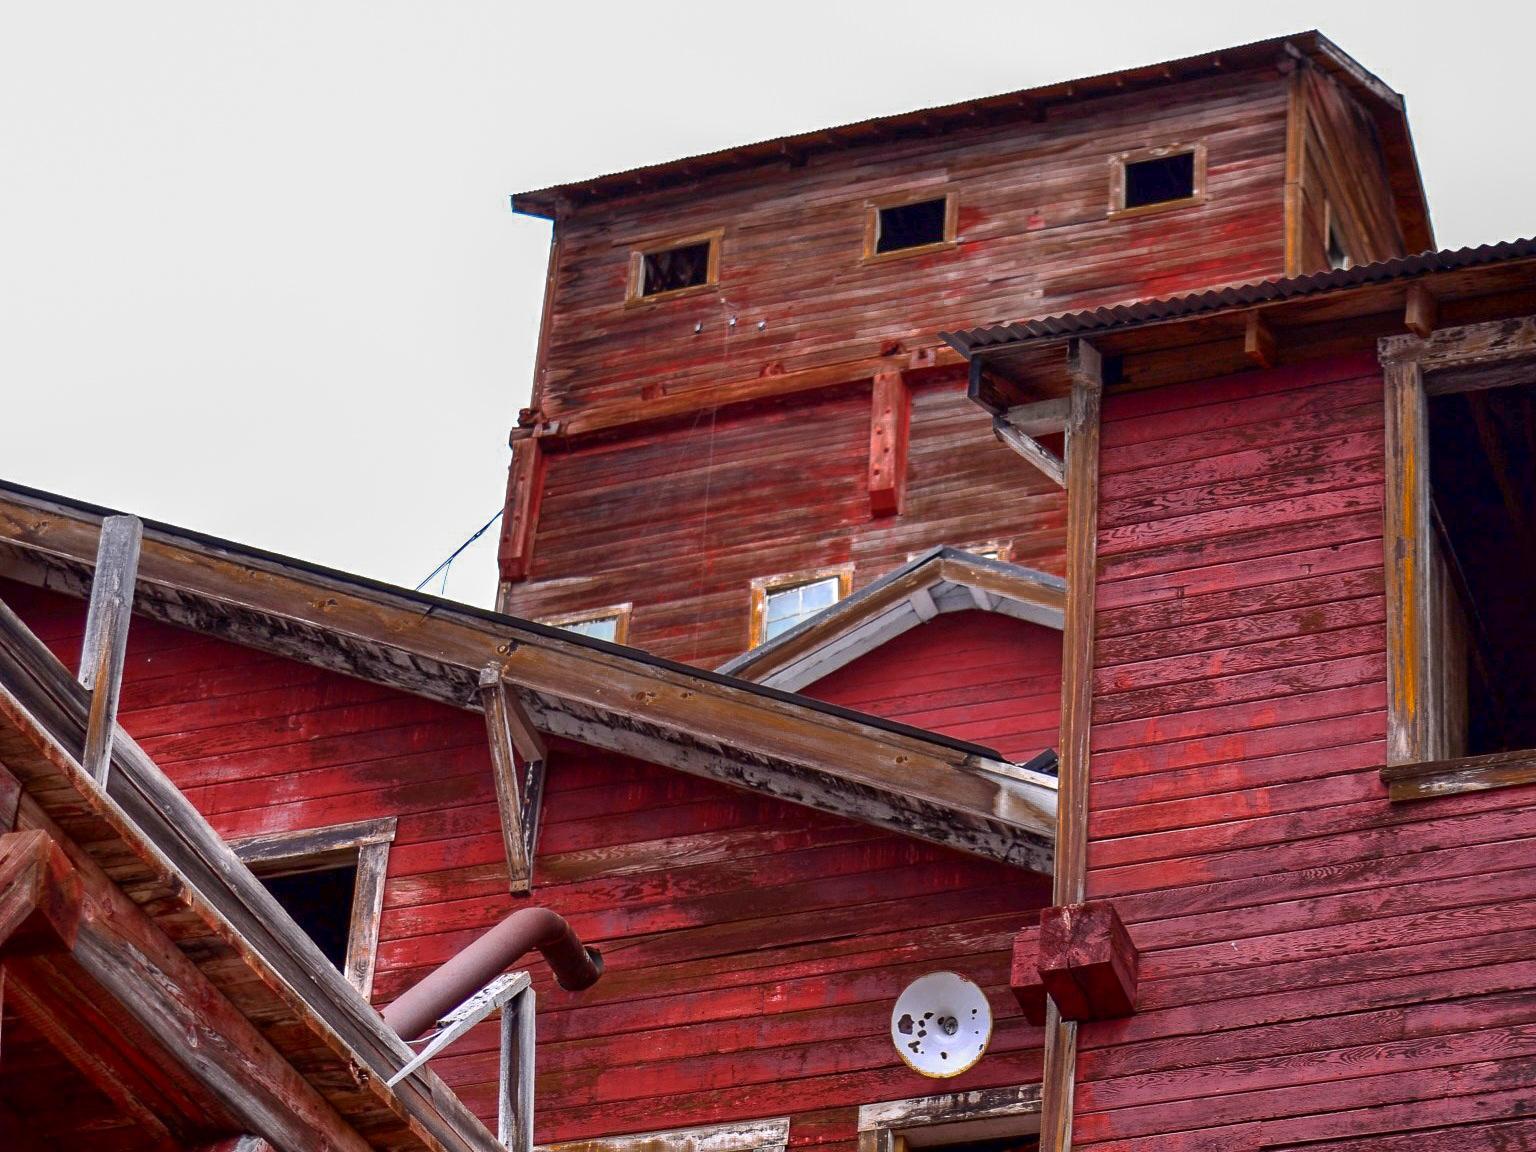 Historic Day-Trip: Kennecott Mill Building